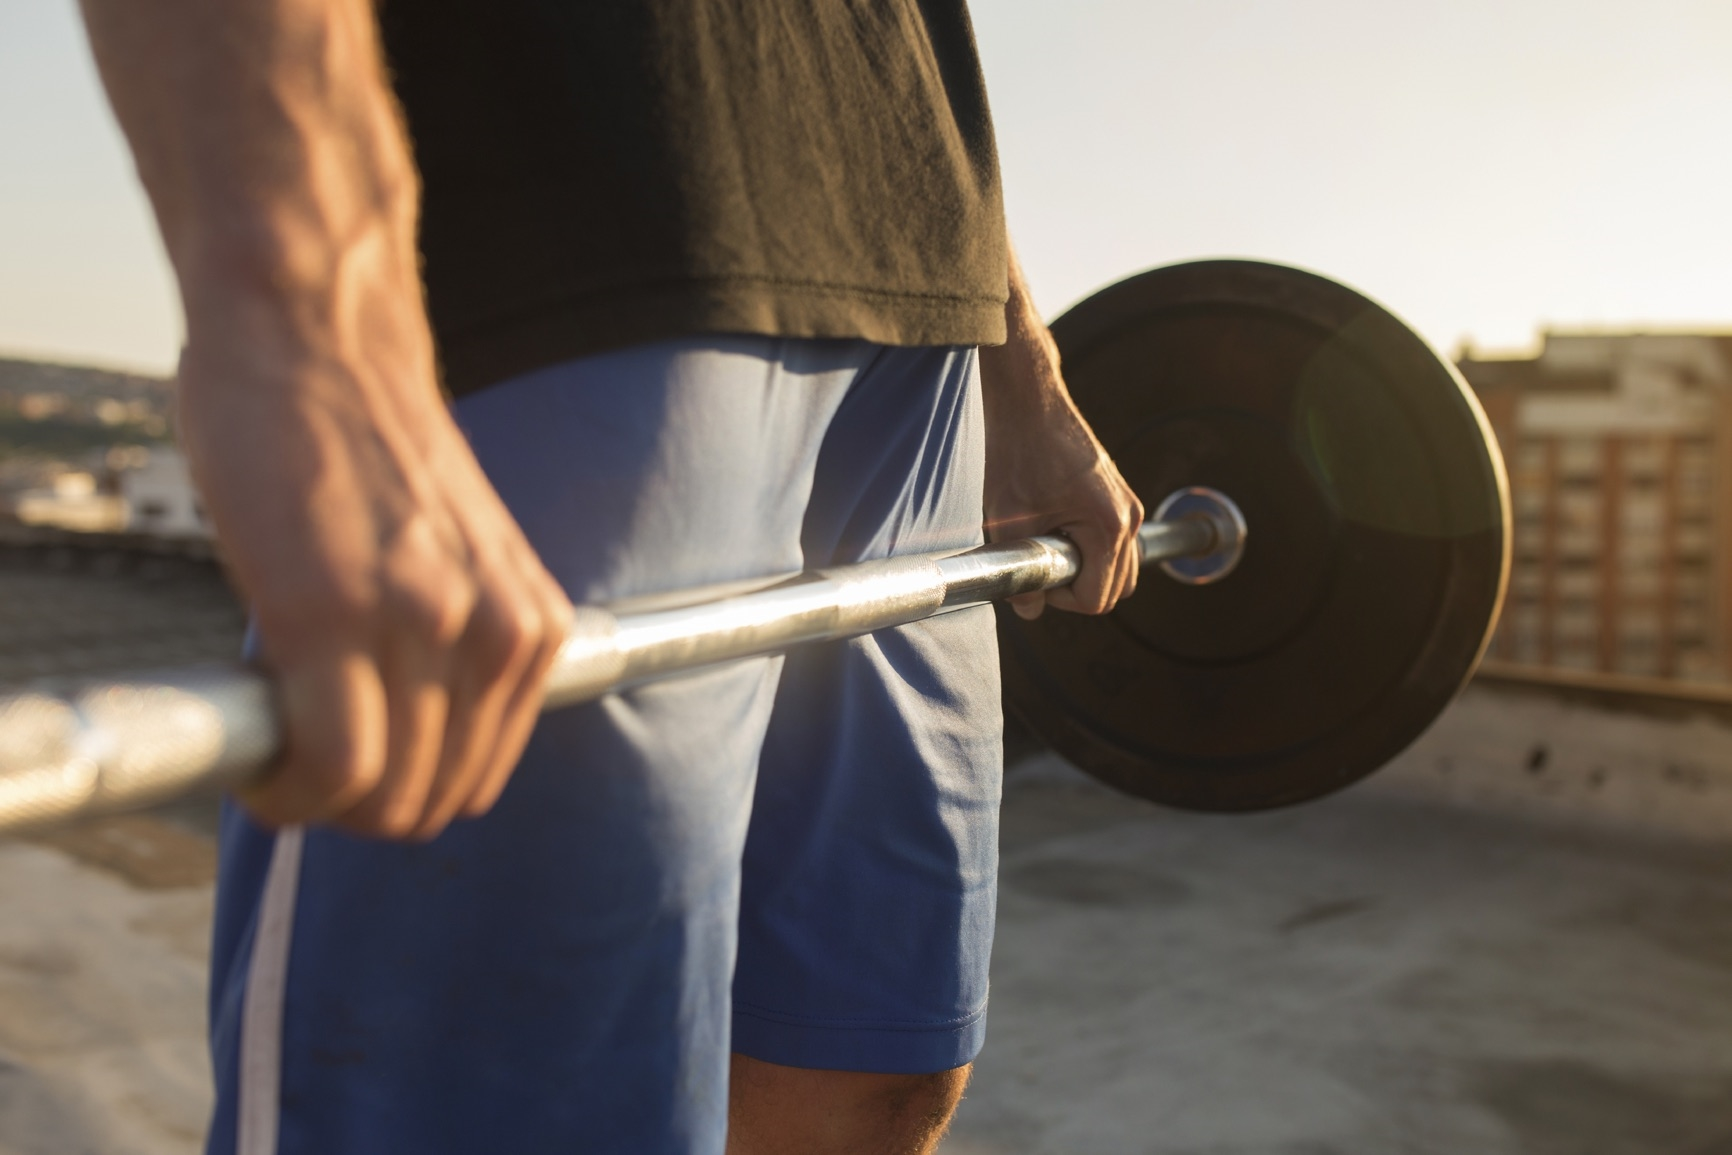 marthas-vineyard-weight-training-1.jpg